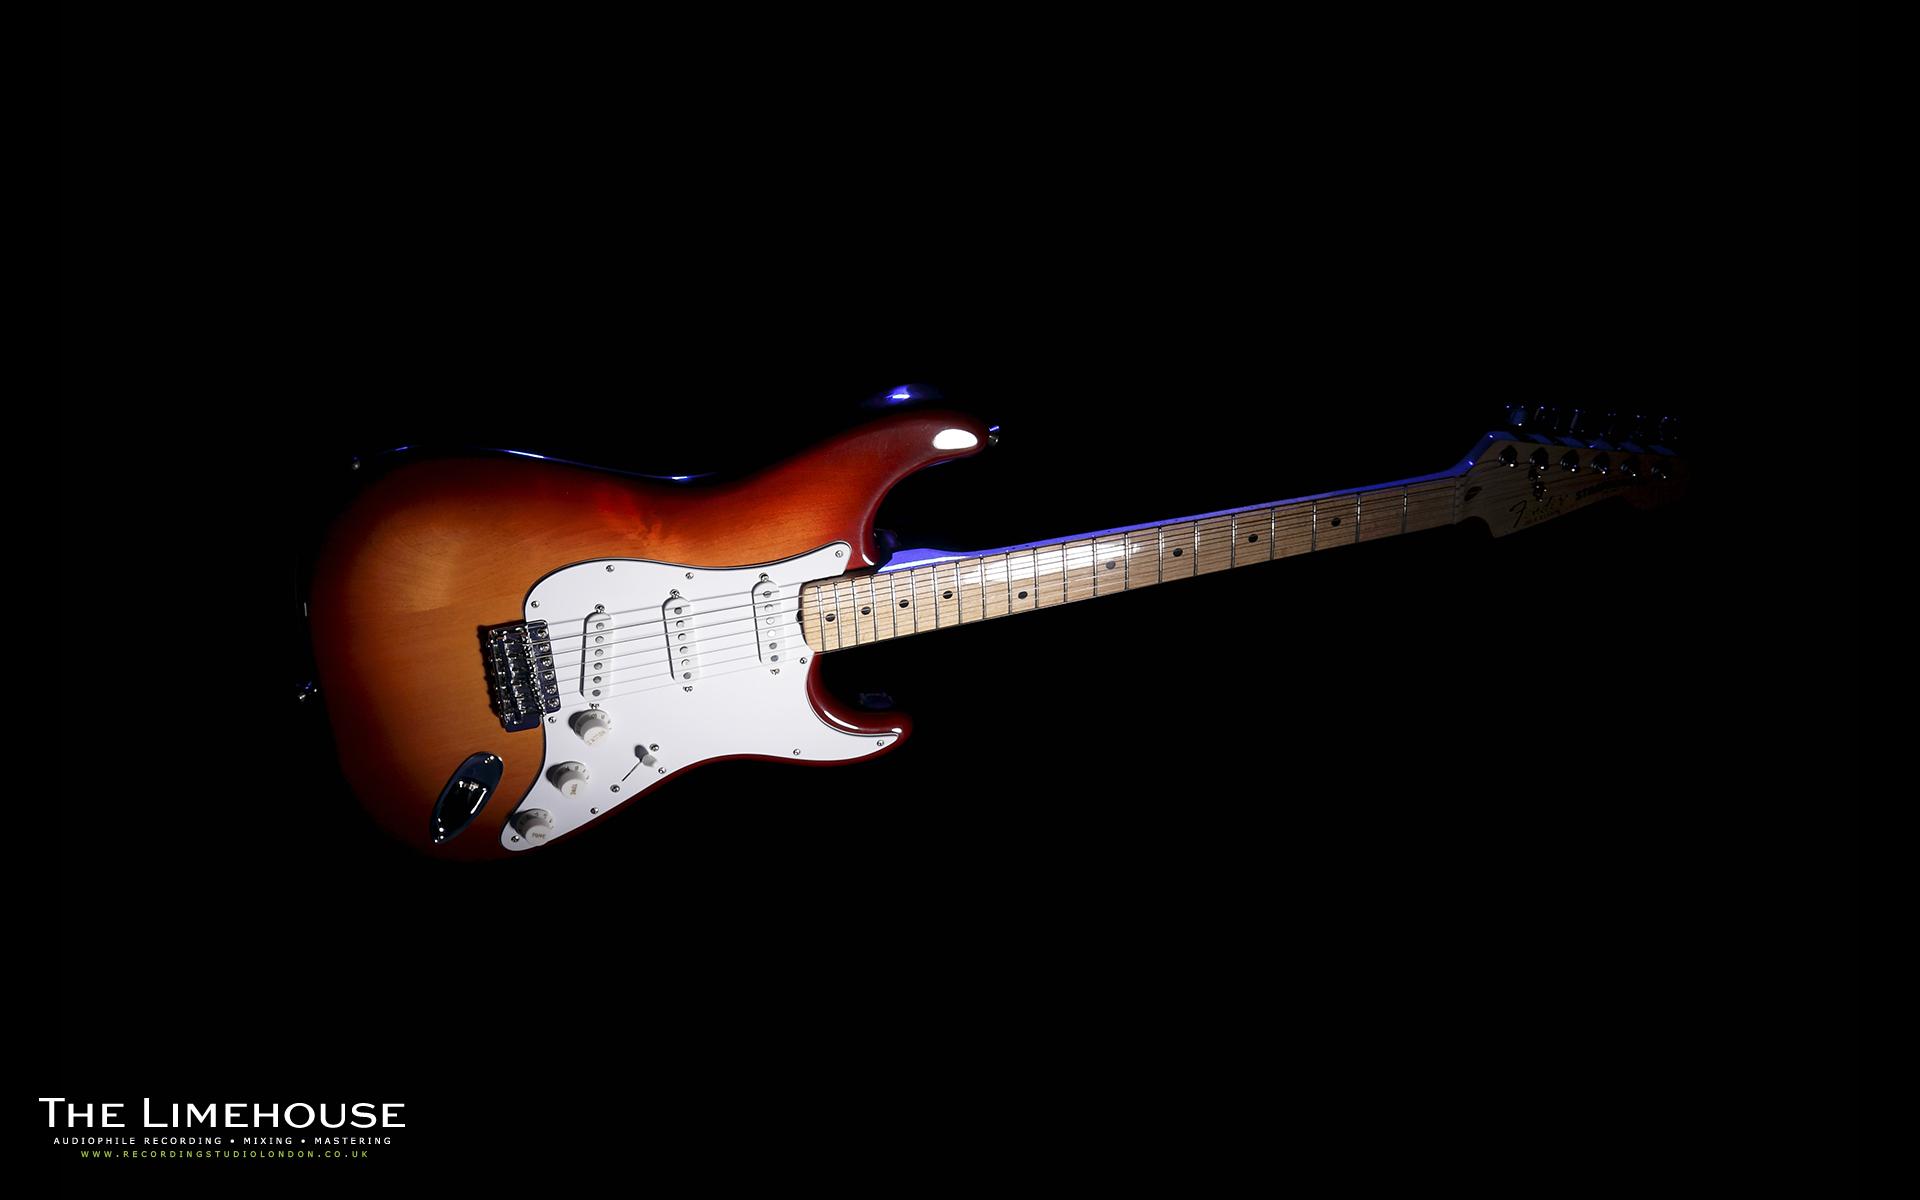 Fender Stratocaster Wallpaper HD - WallpaperSafari